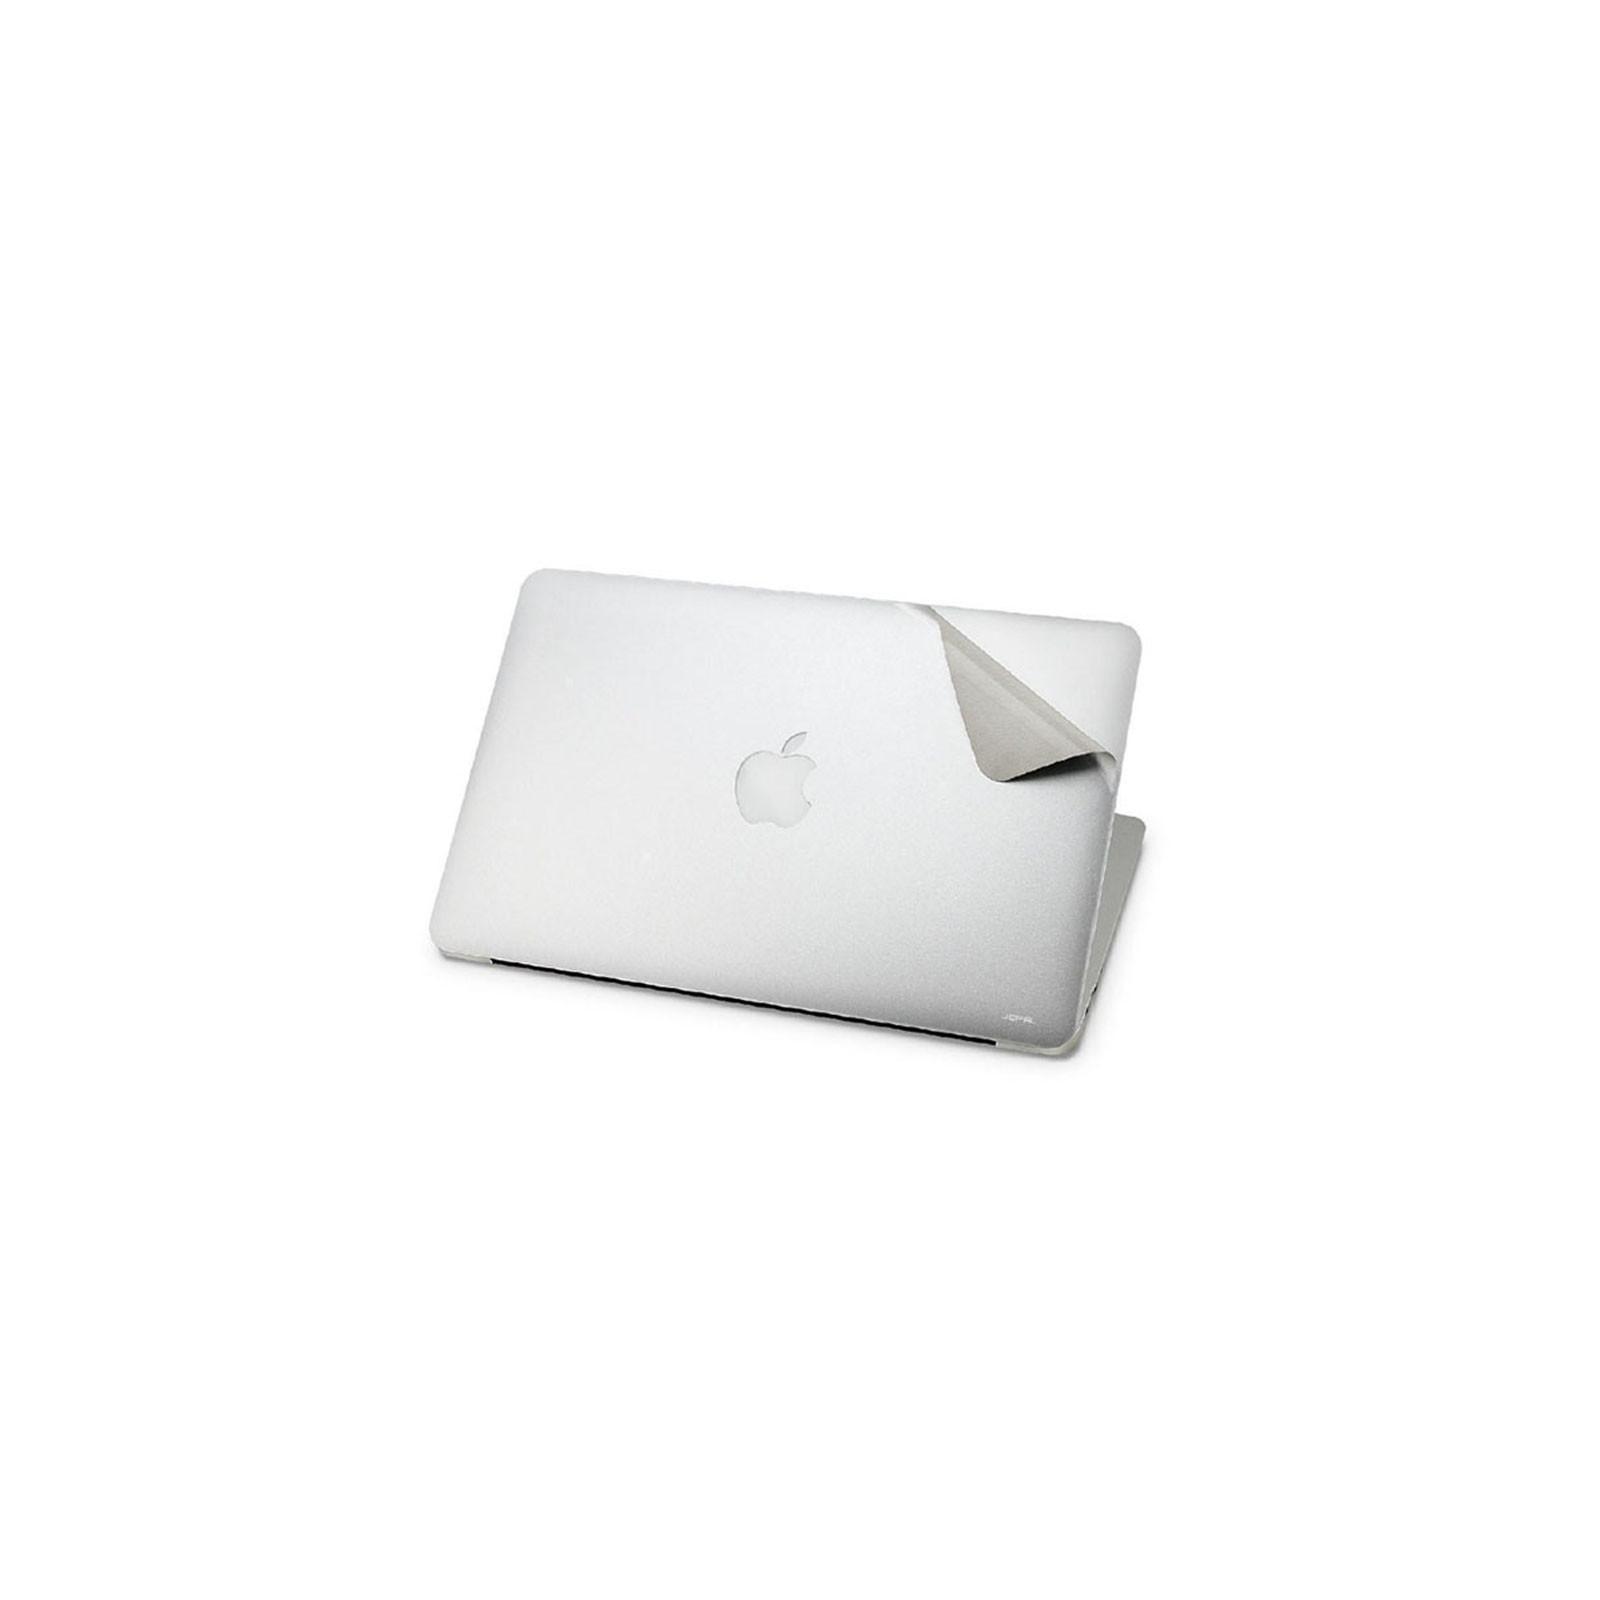 Пленка защитная JCPAL 3 in 1 set для MacBook Air 11 (JCP2043) изображение 3